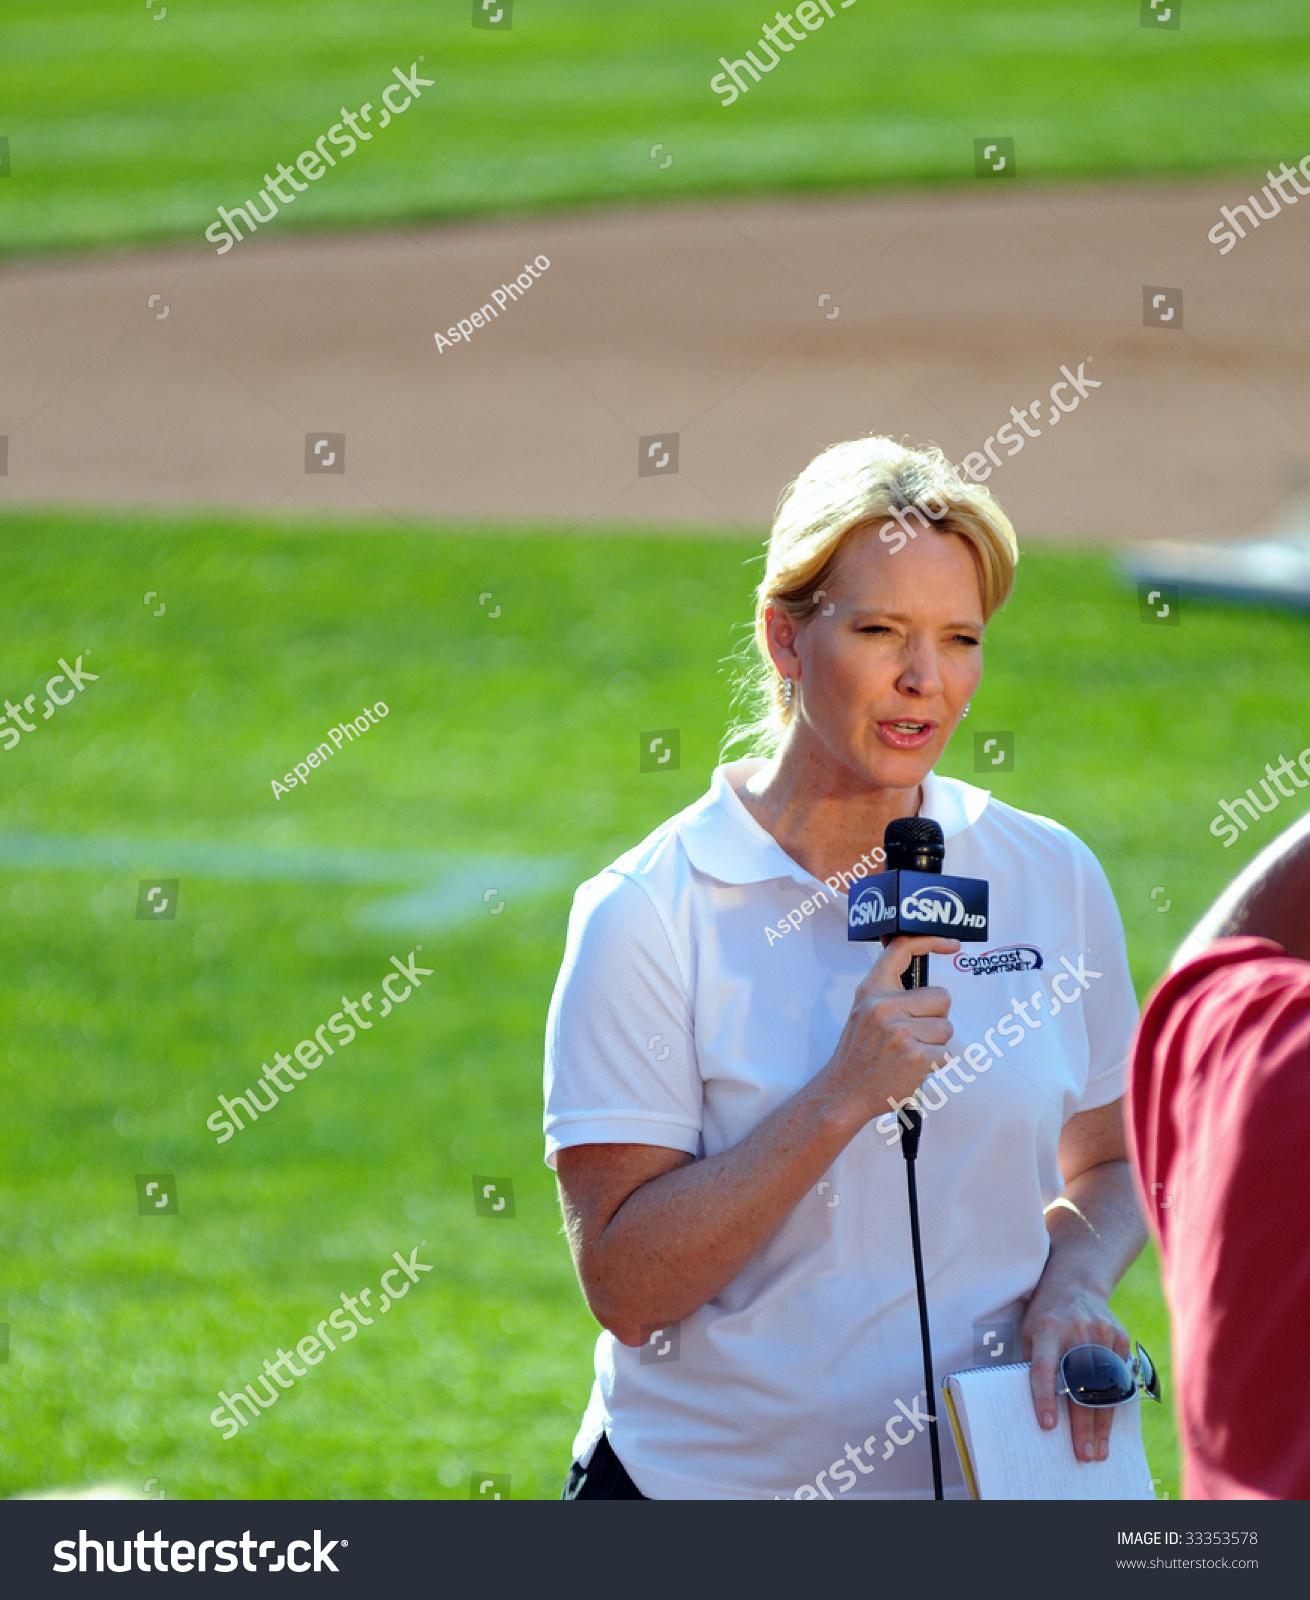 philadelphia comcast sportsnet announcer stock photo philadelphia 7 comcast sportsnet announcer leslie gudel on air prior to a